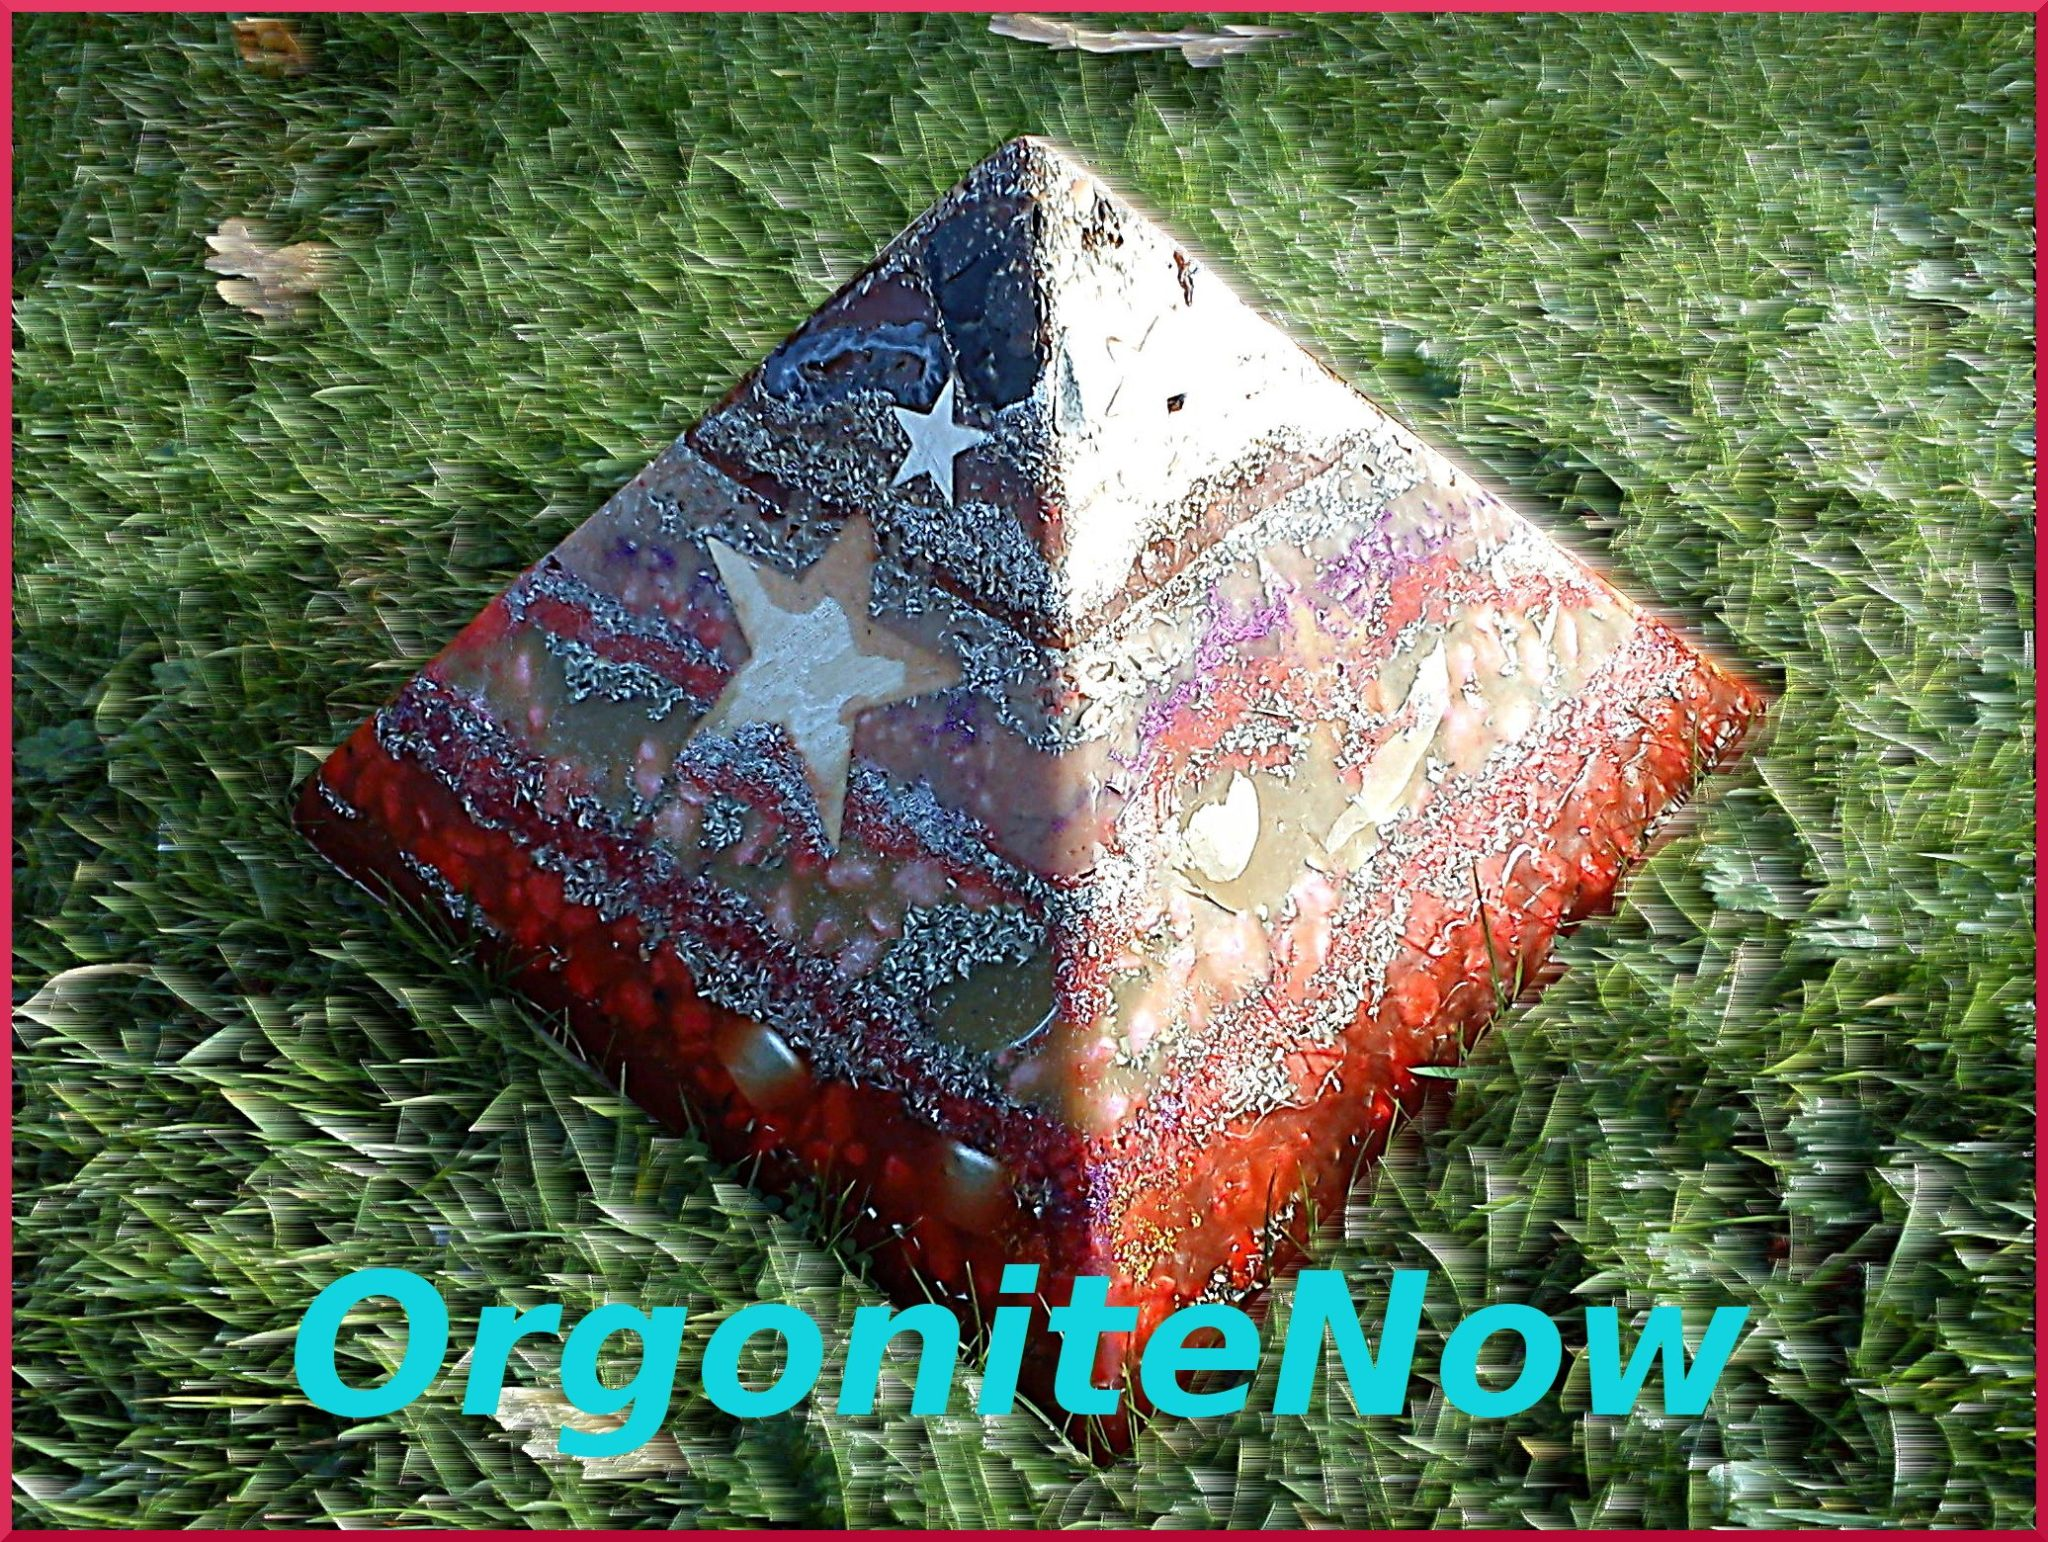 Orgonite now, de nieuwe site van Orgonite-Mareksheran